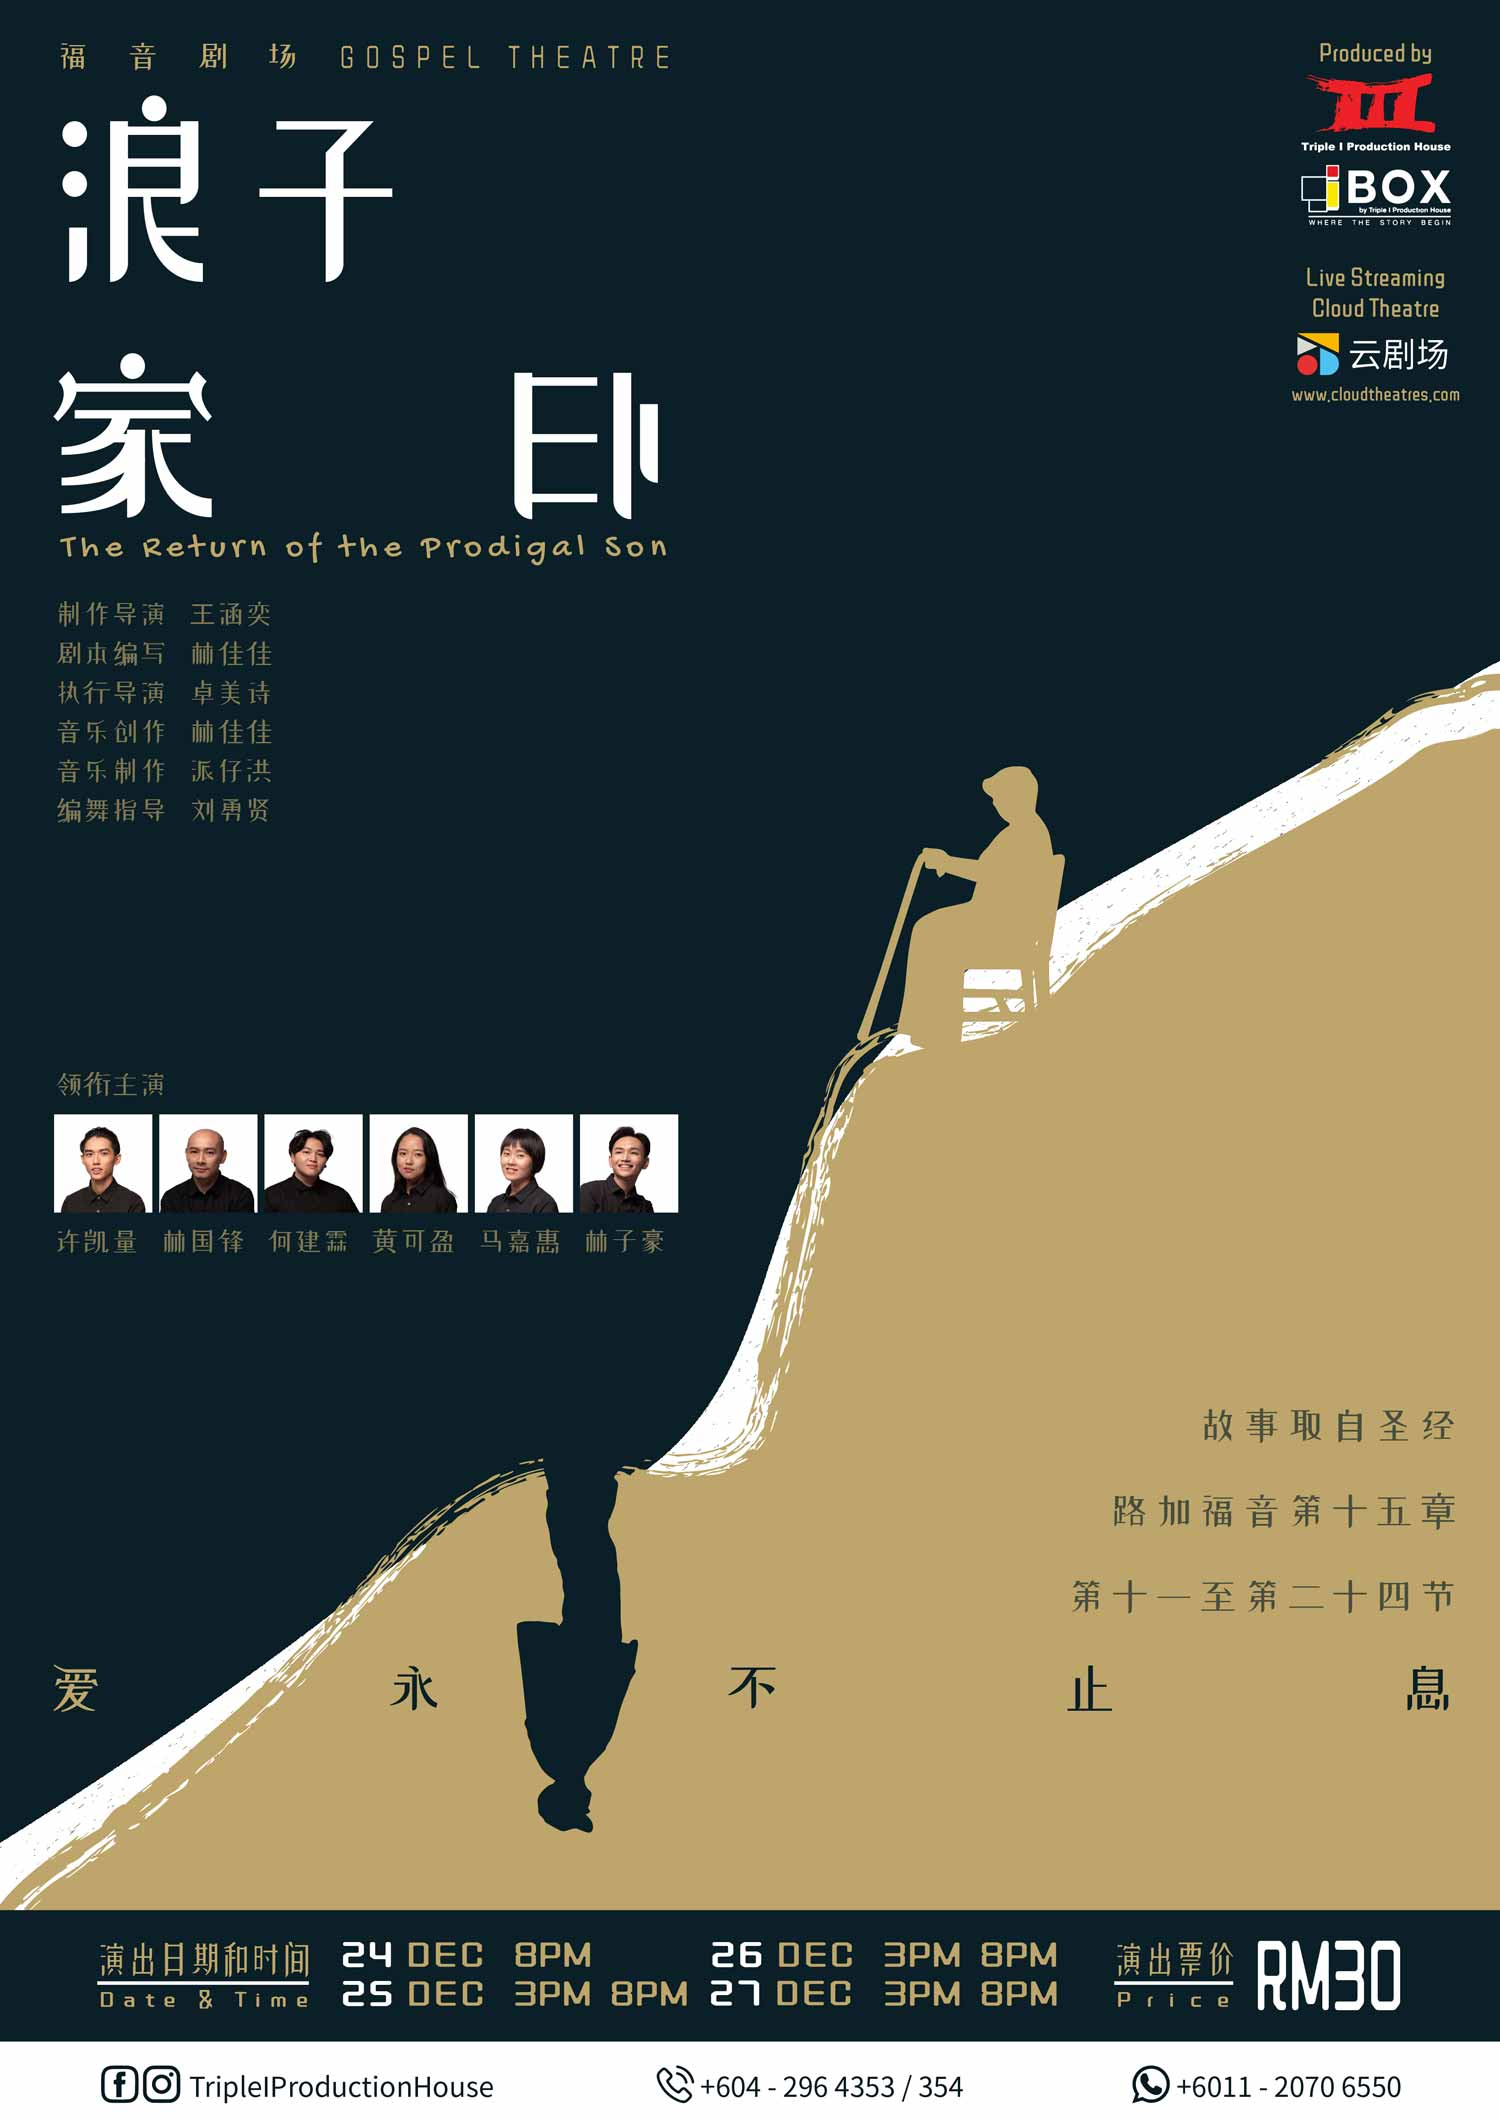 福音剧场【浪子归家】 Gospel Theatre: The Return of the Prodigal Son